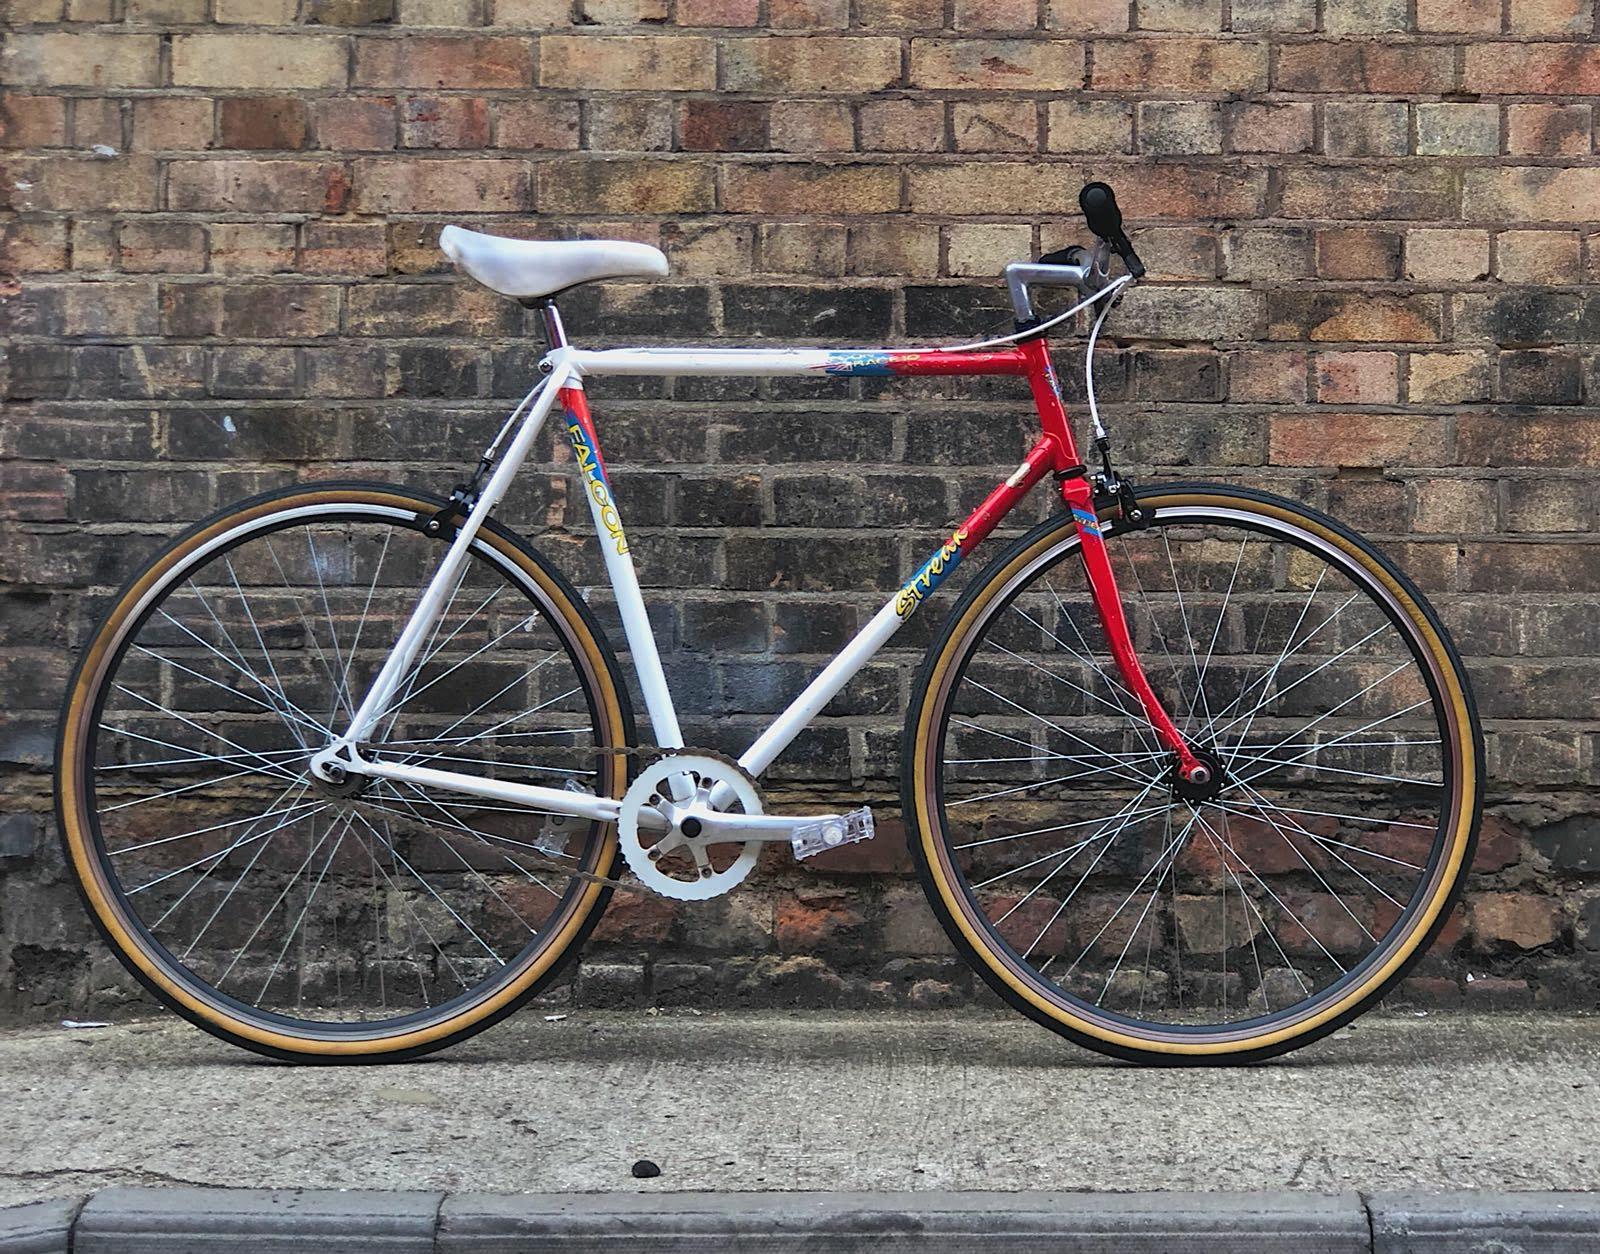 bike-repairs-hackney-reviews.jpg